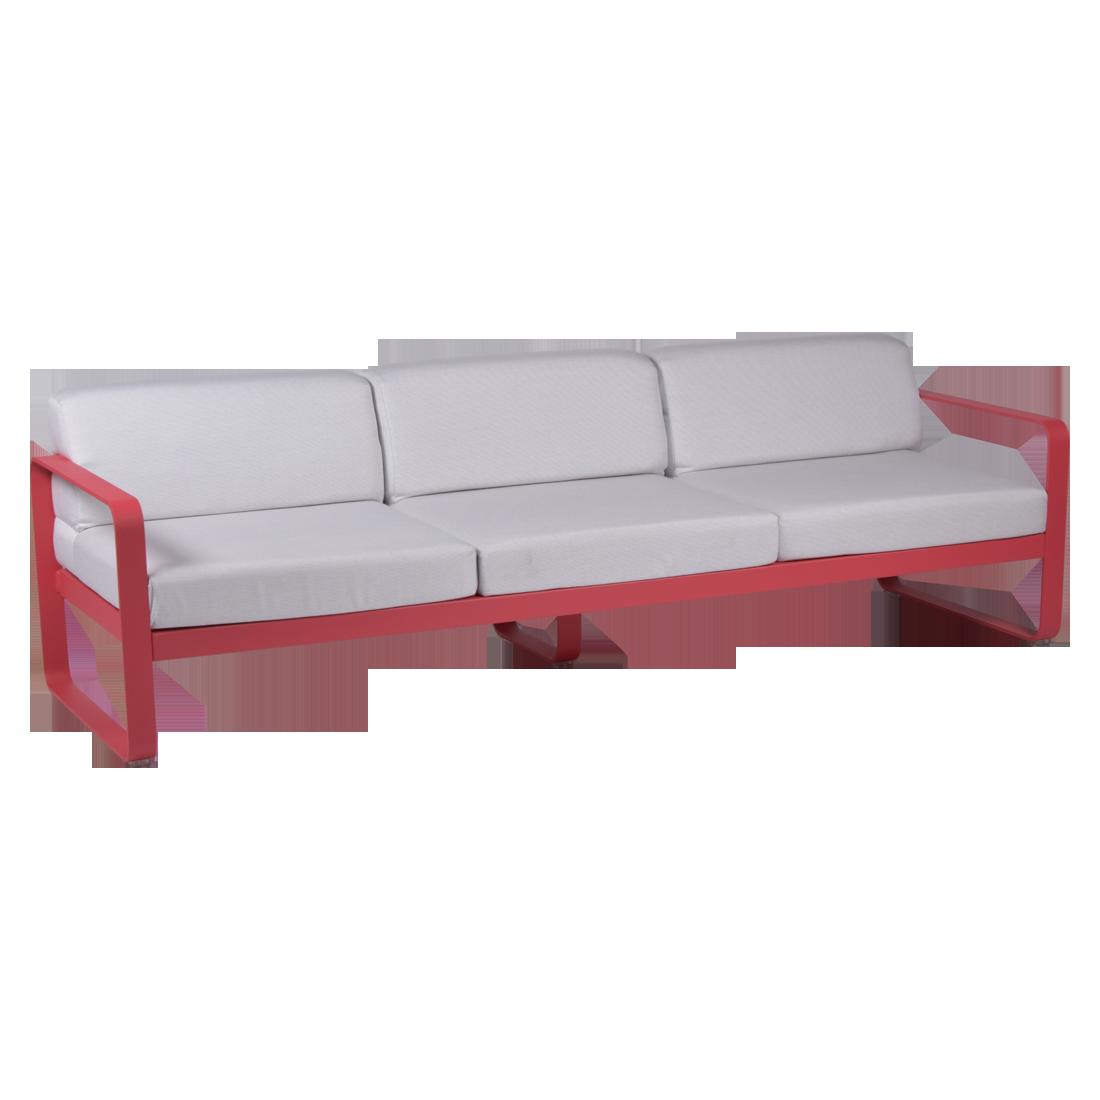 canape de jardin, canape d exterieur, canape fermob, canape metal, canape rose